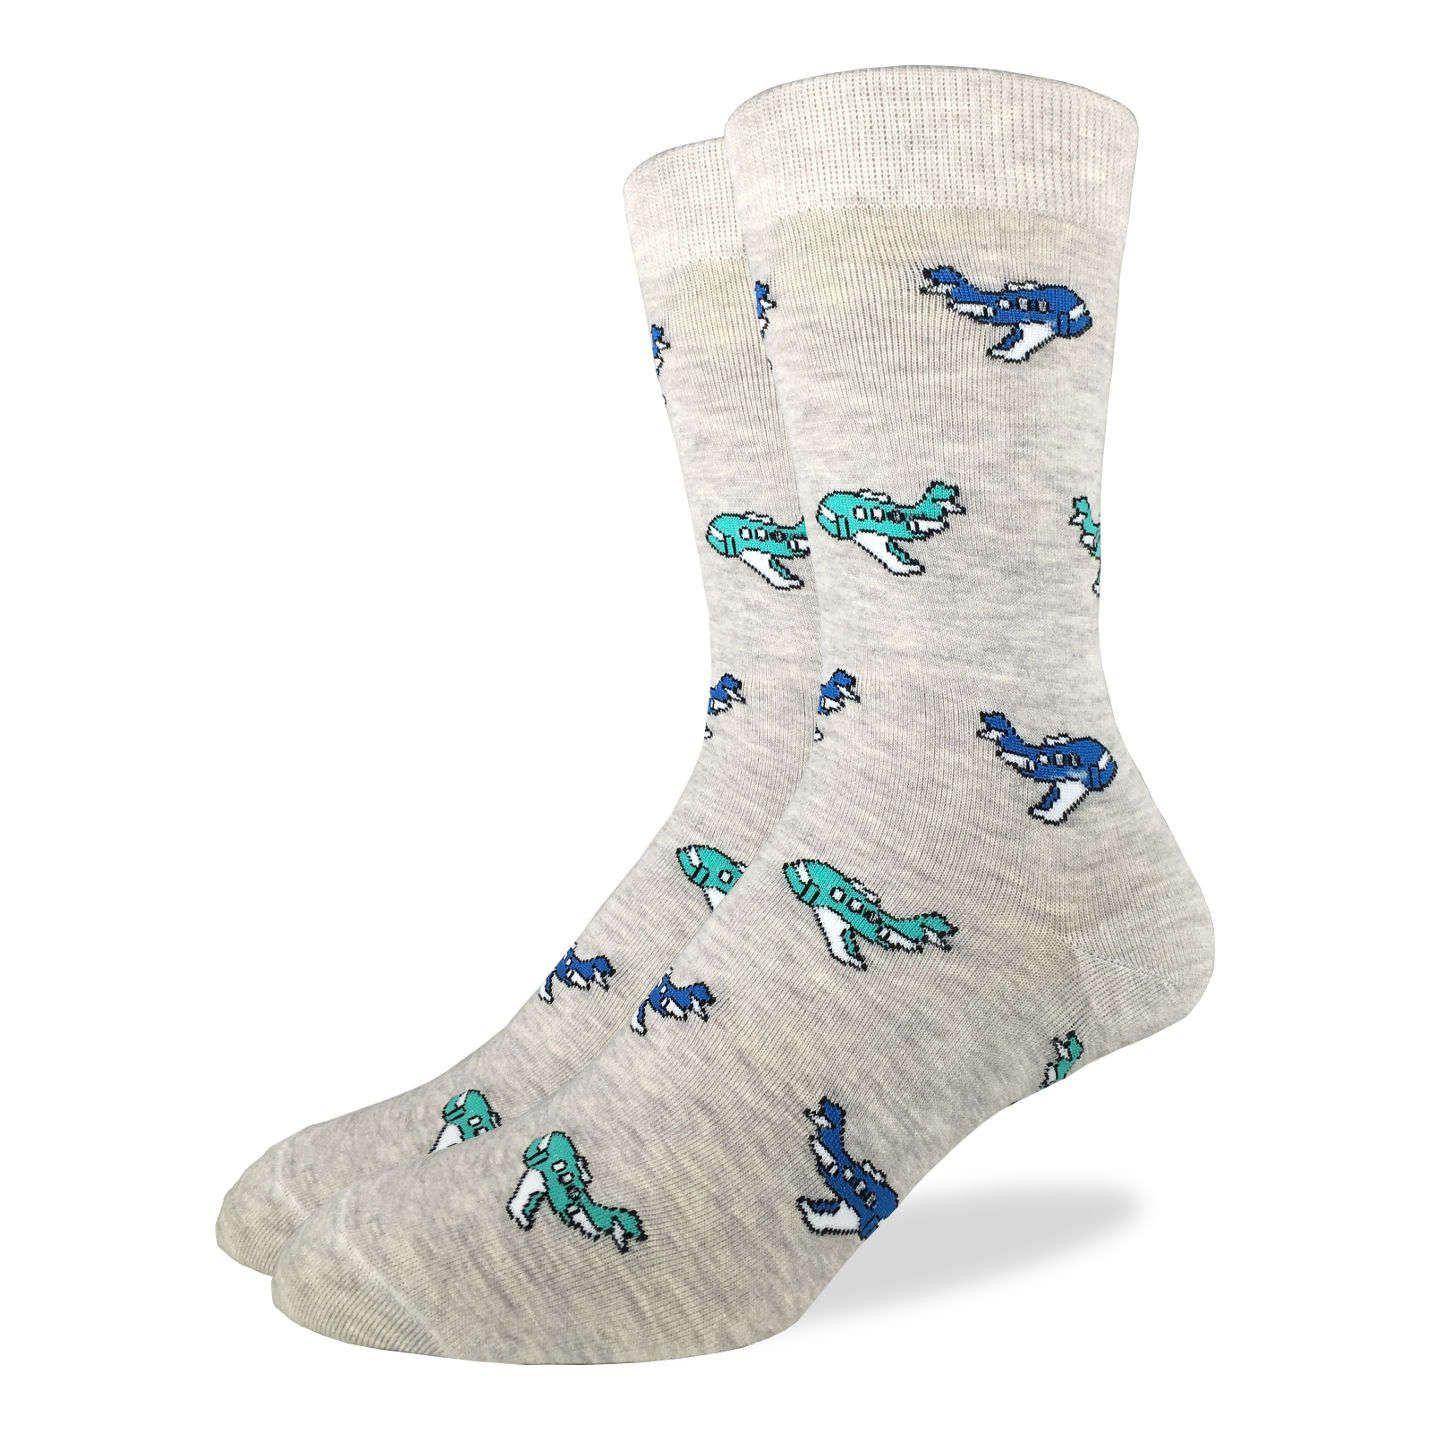 f2bc37985900 Airplanes | Products | Socks, Crew socks, Aeroplane